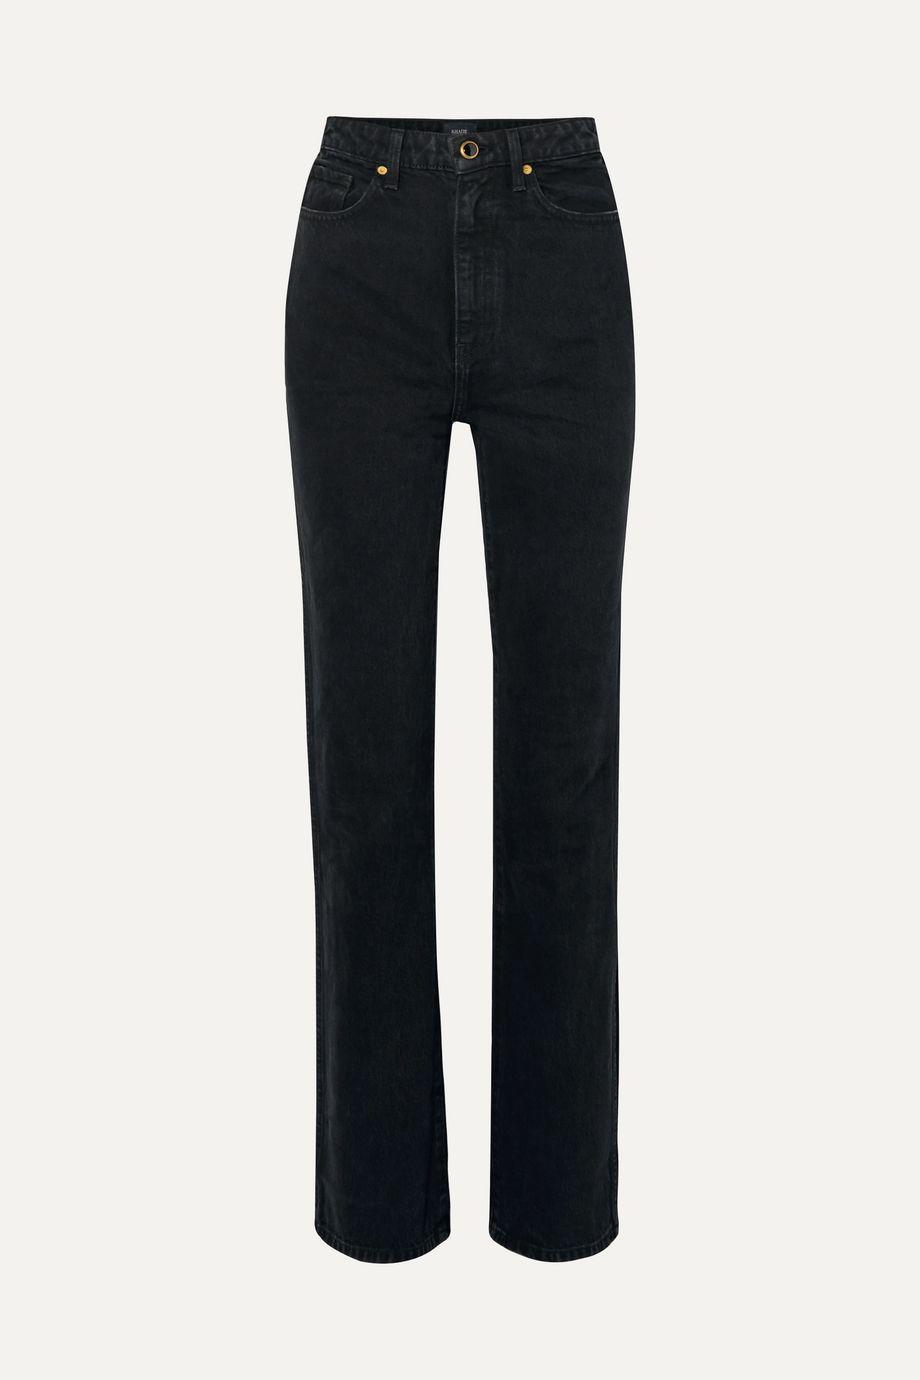 Khaite Danielle 高腰直筒牛仔裤